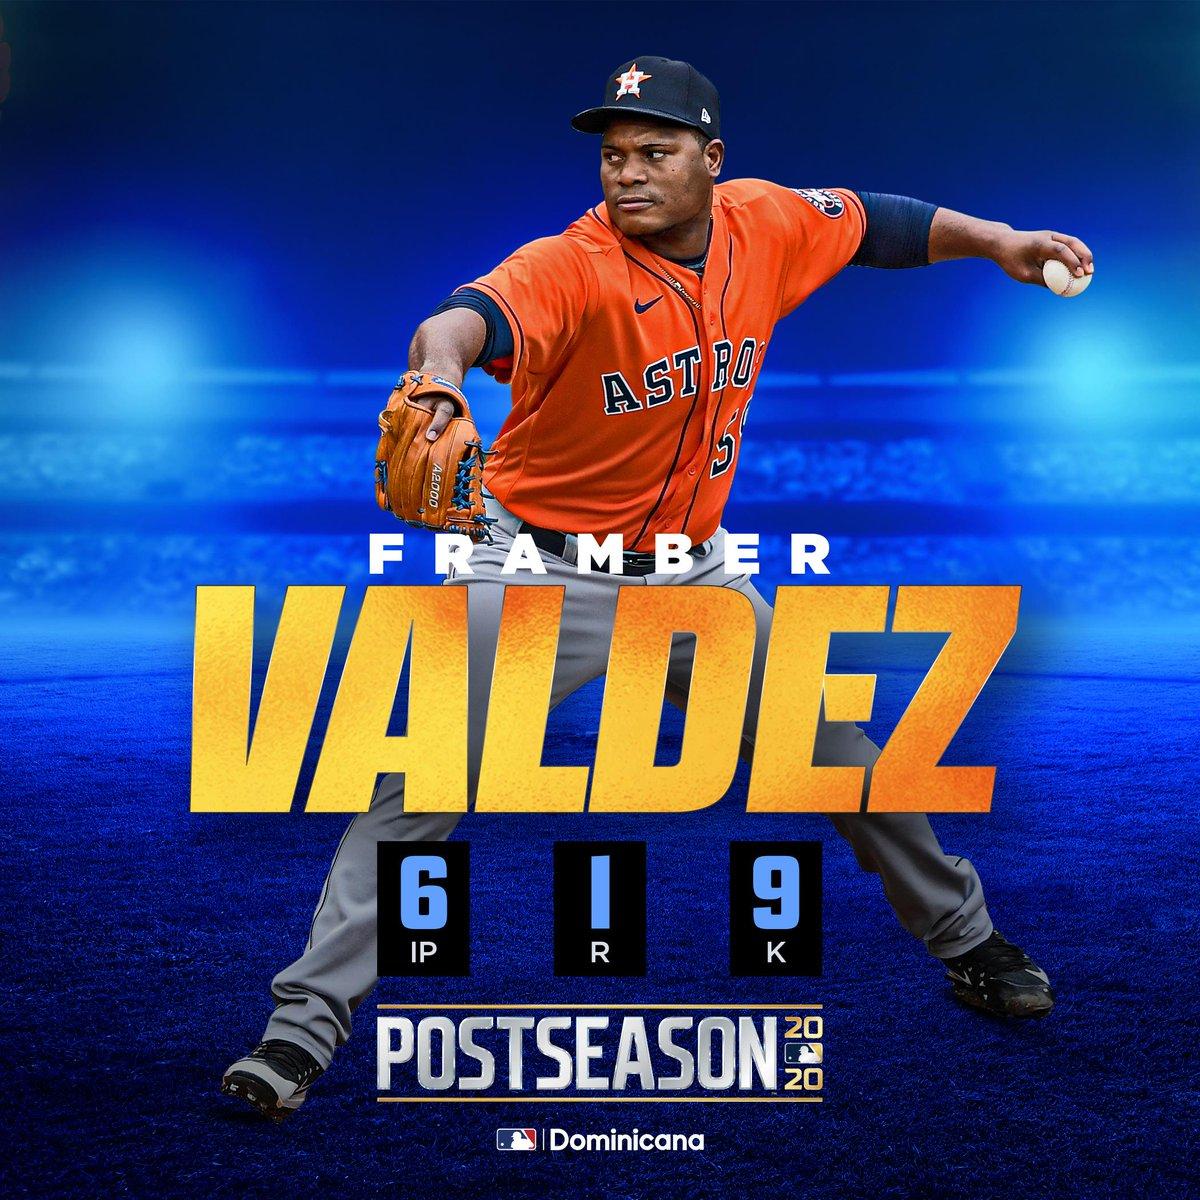 @MLBDominicana's photo on Valdez